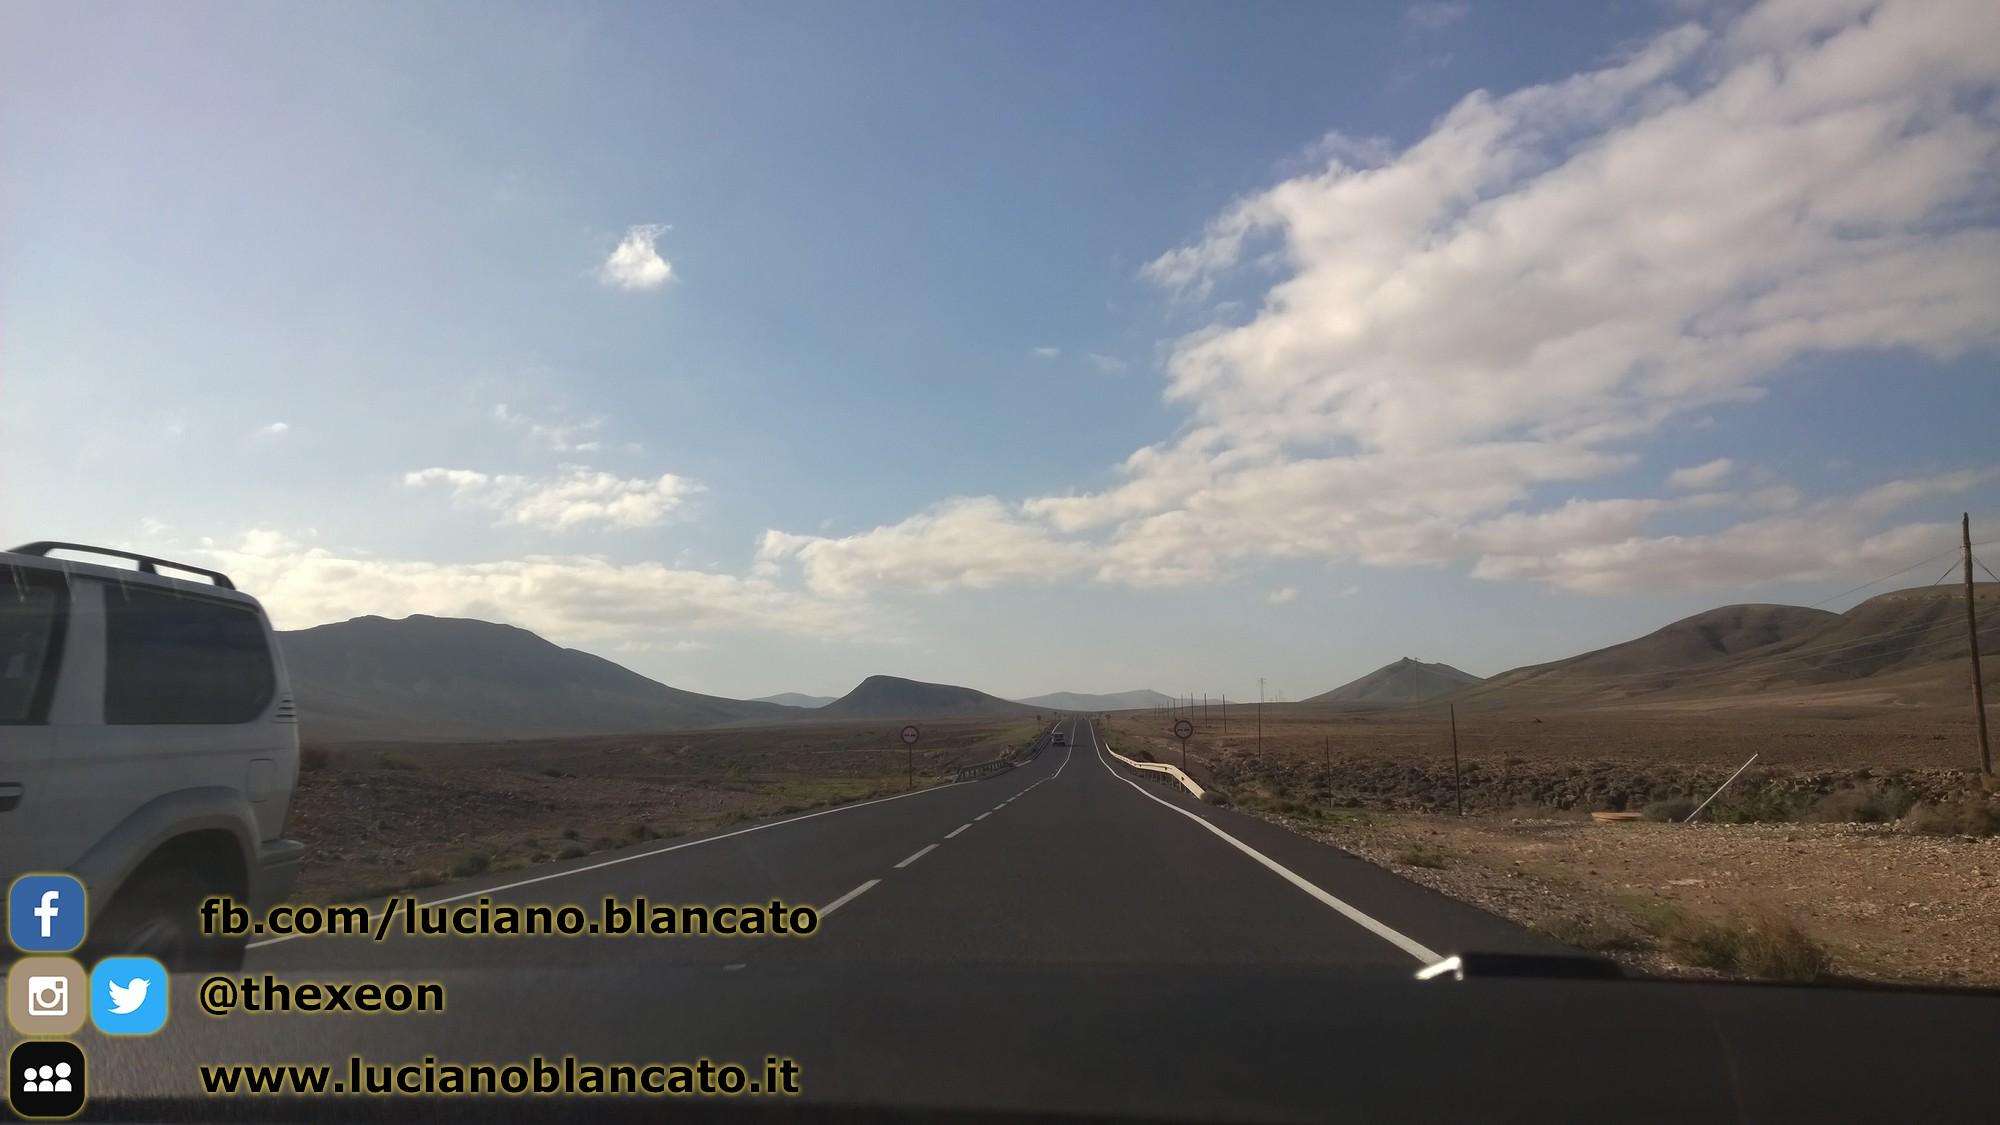 Fuerteventura - Spagna - 2014 - foto n. 0026